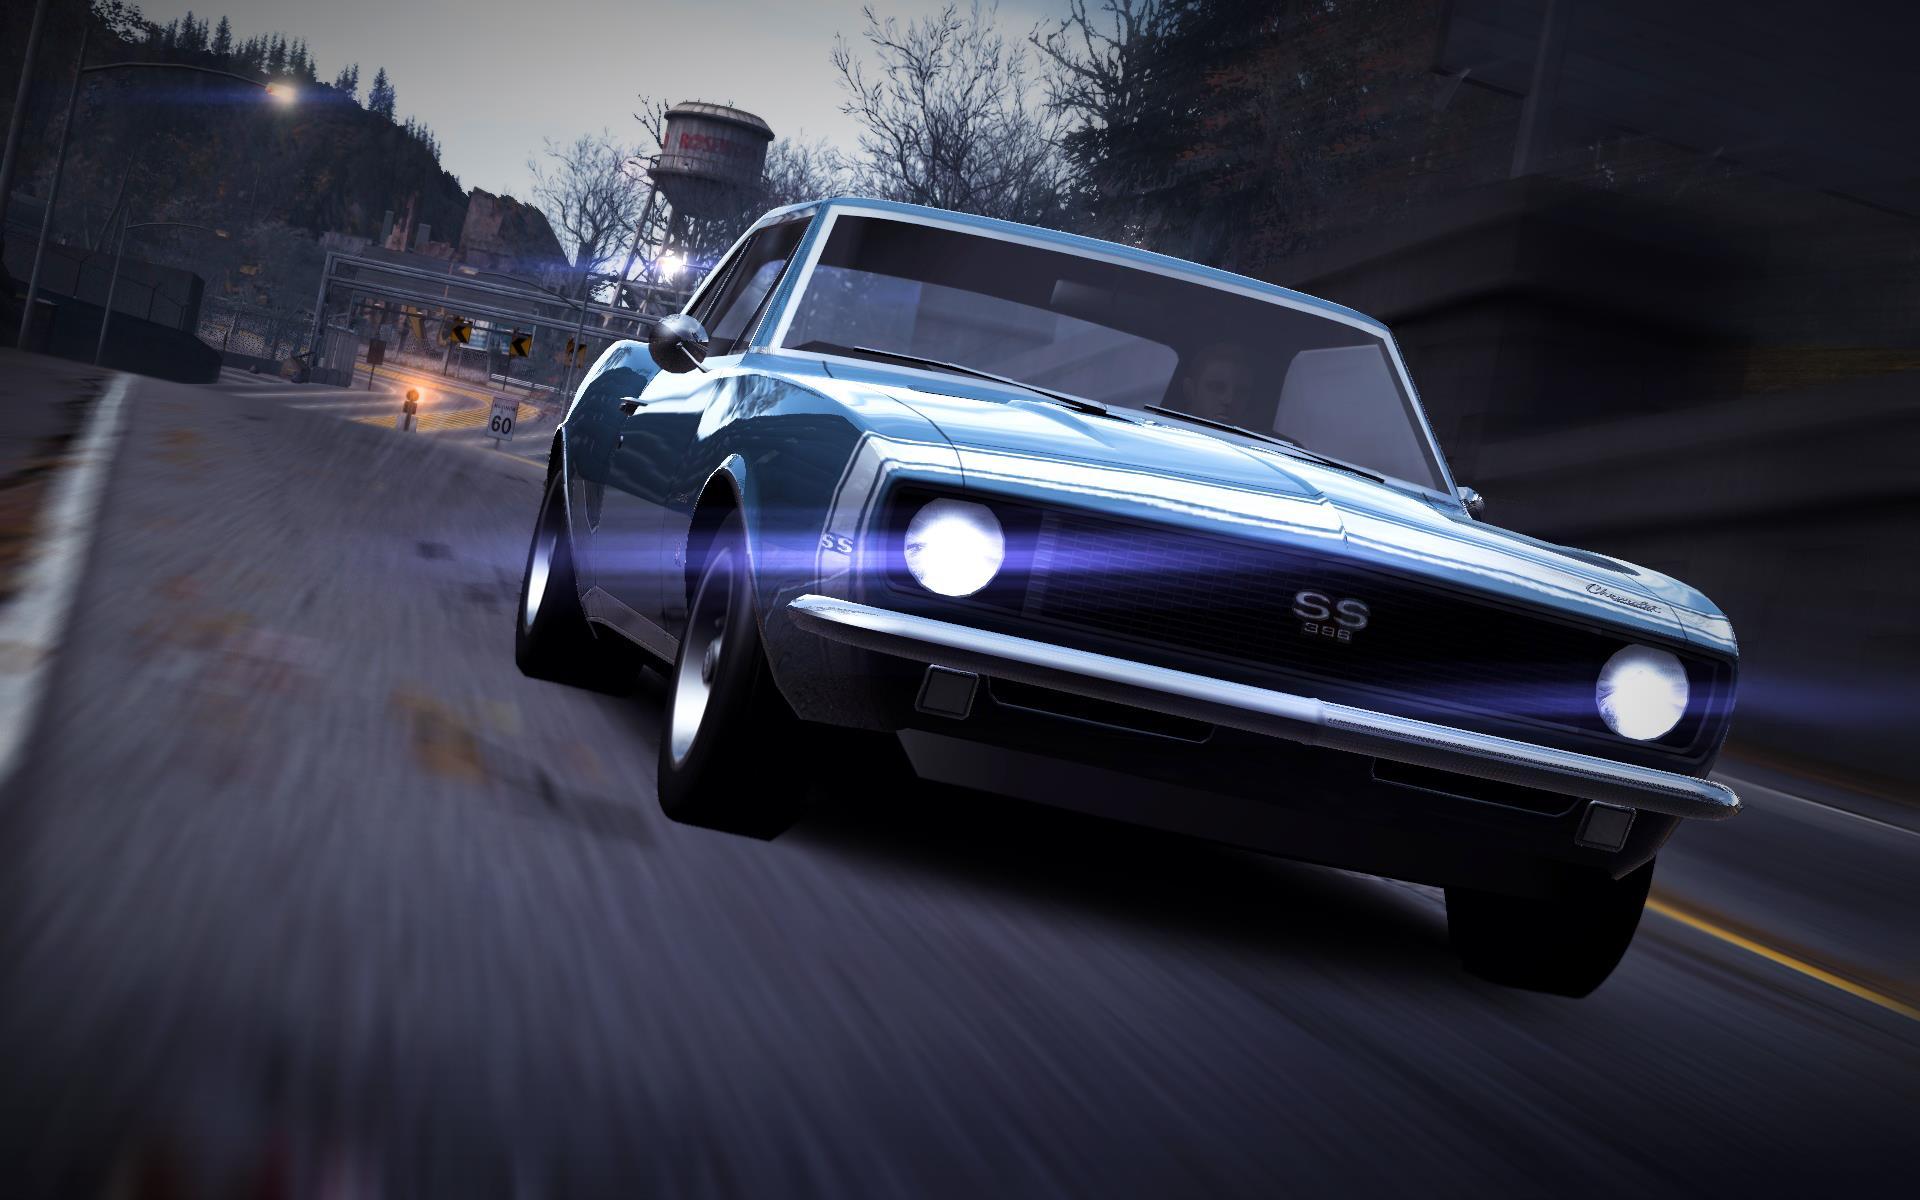 Image Carrelease Chevrolet Camaro Ss Blue Jpg Nfs